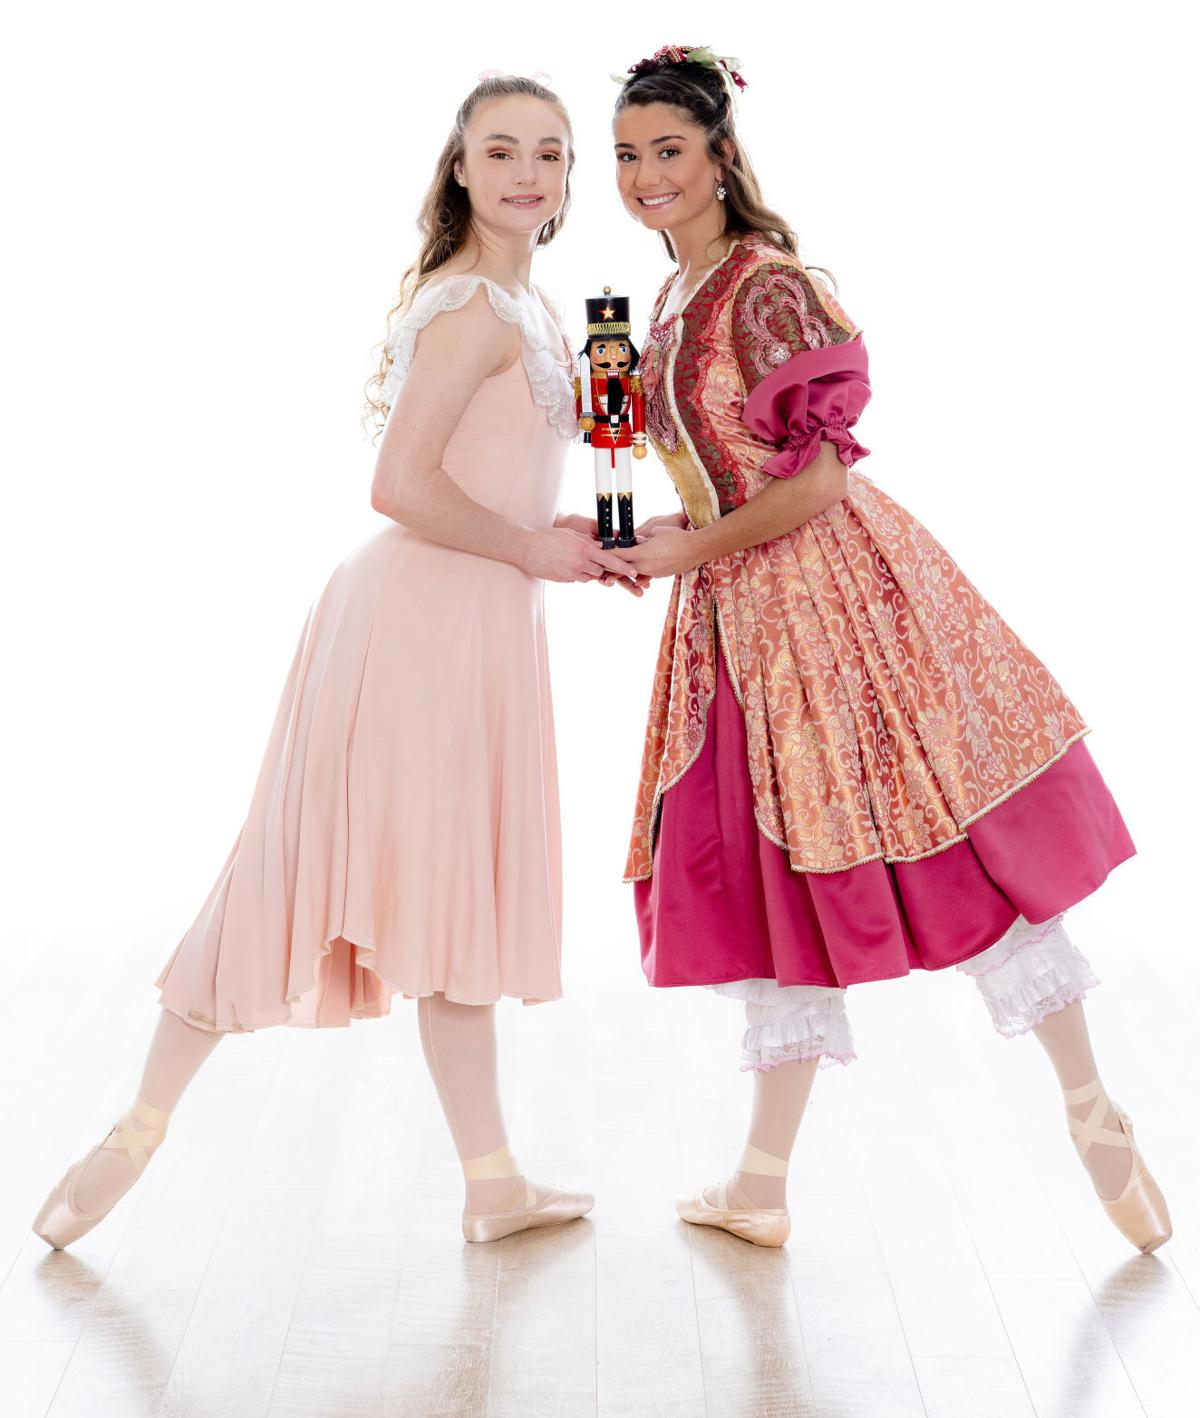 Abigail Hovendick and Maggie Oulianova as Clara